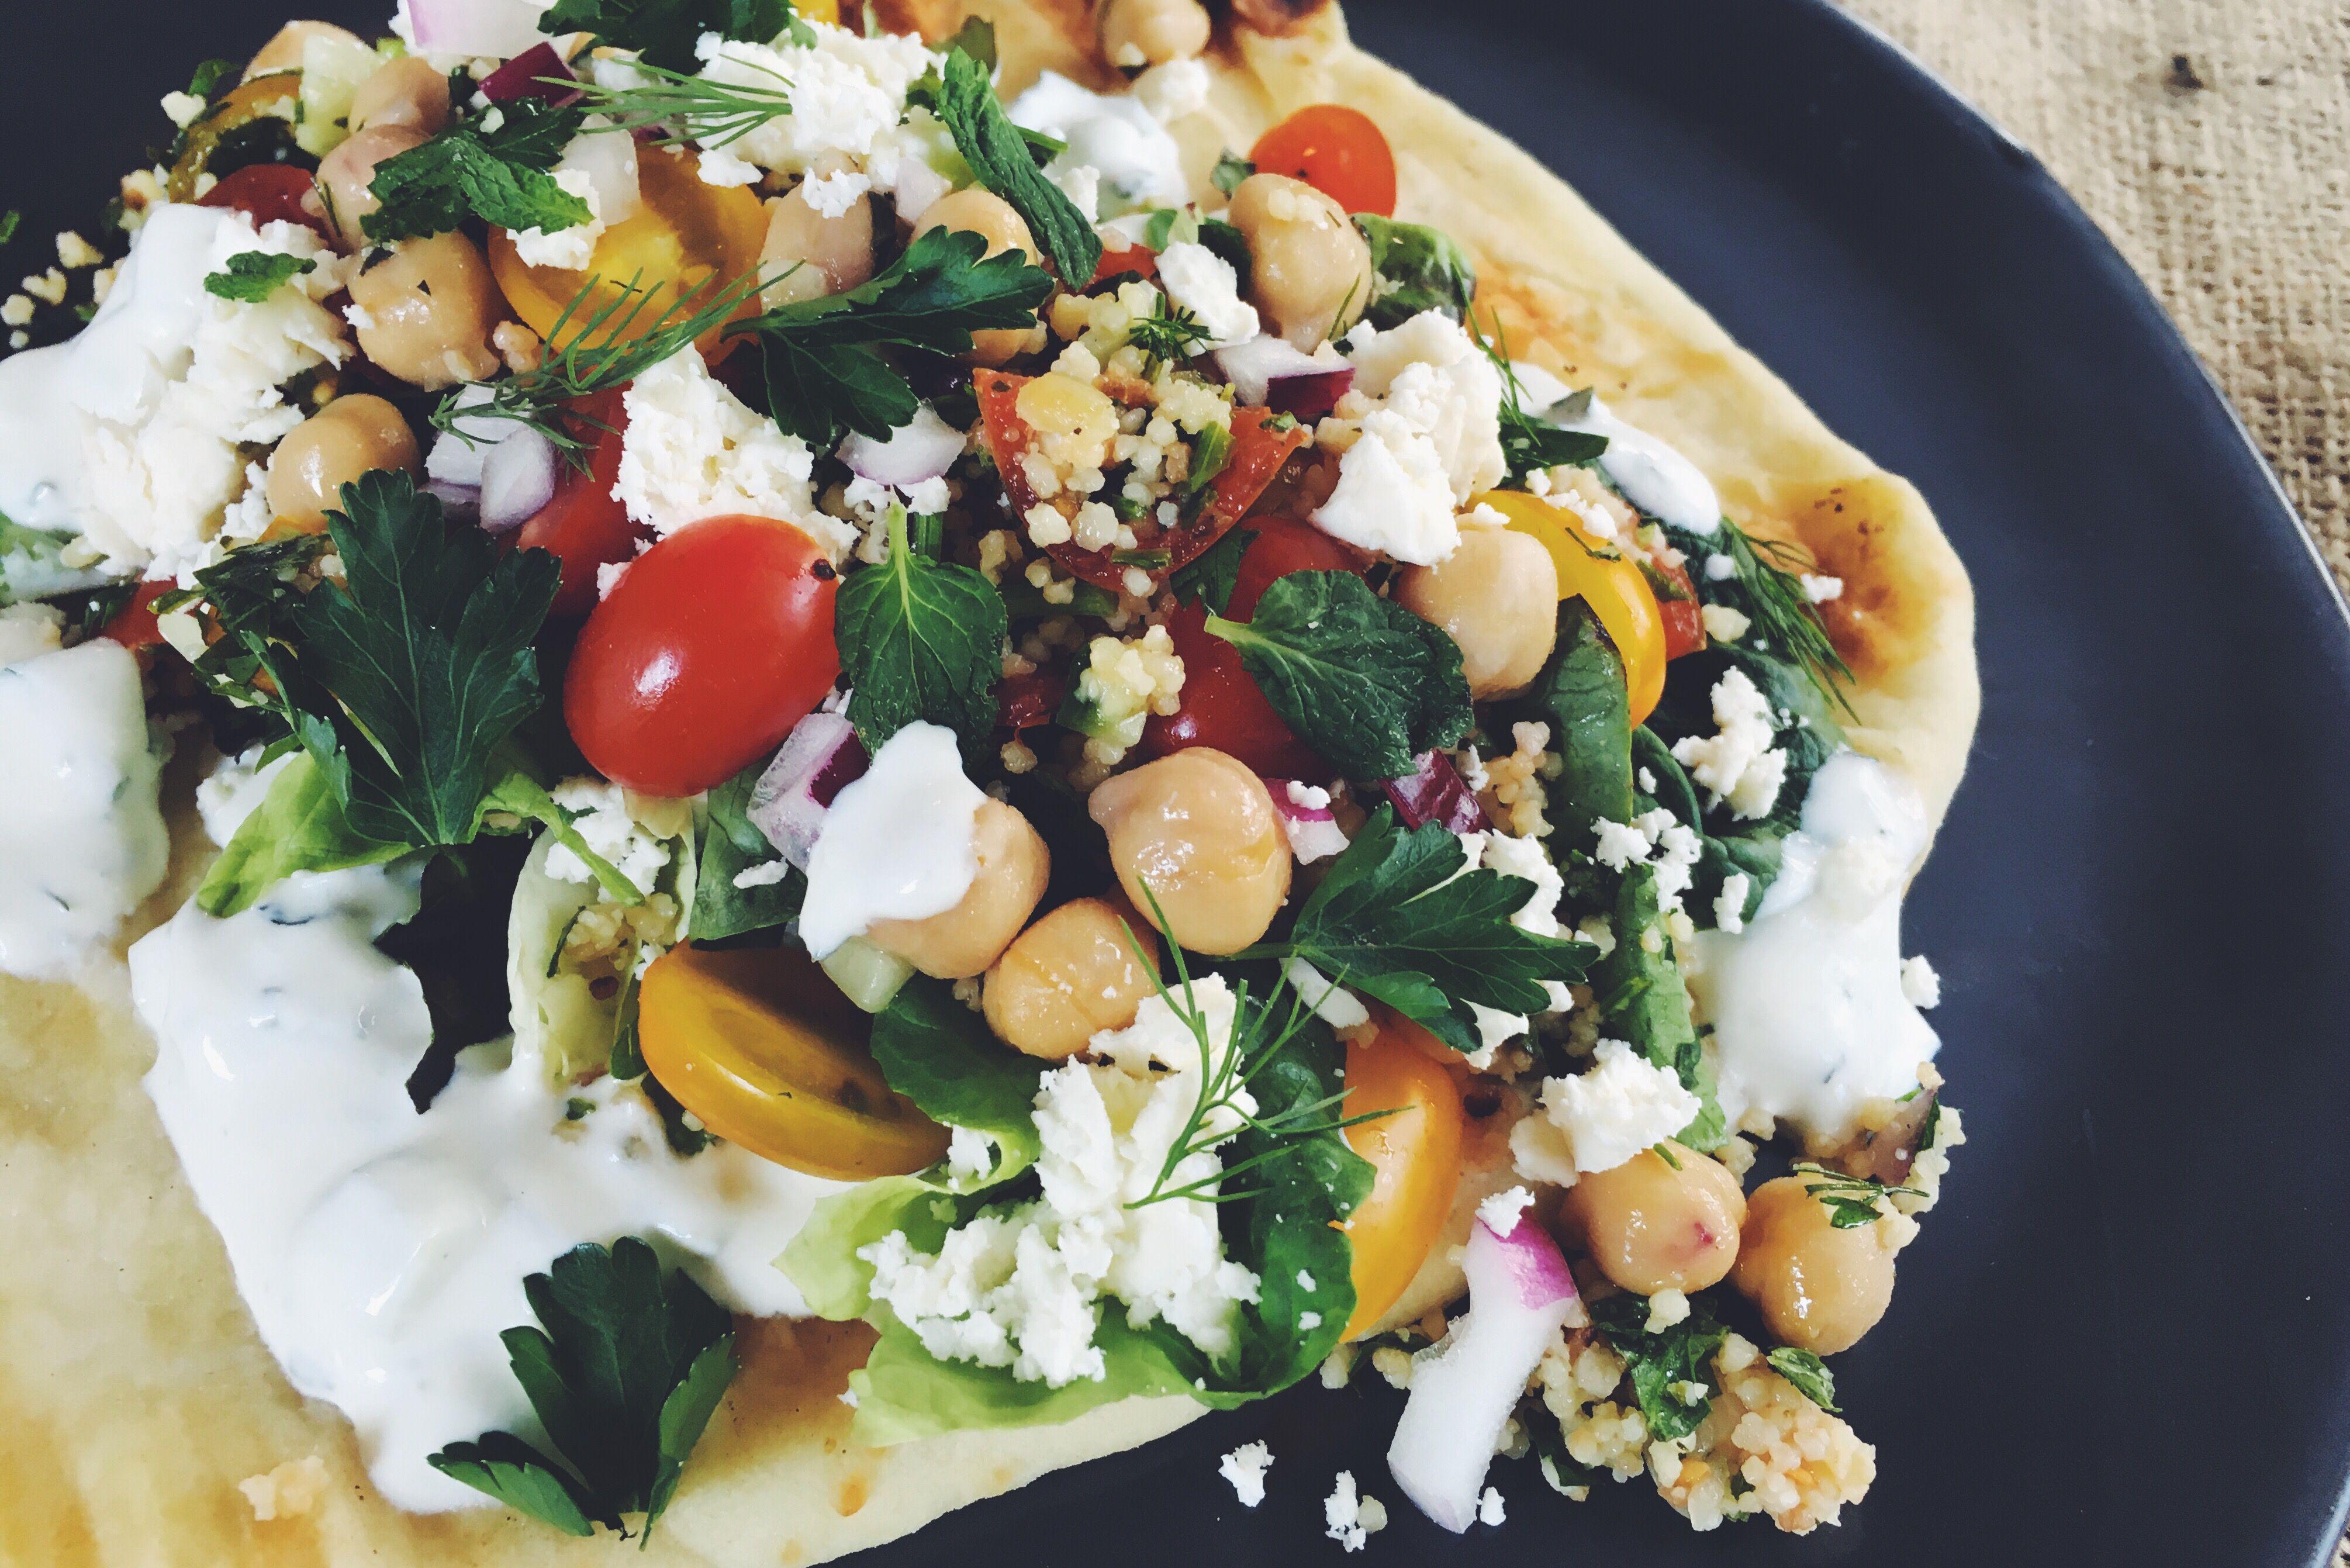 Middle Eastern Vegetable Pita Sandwich